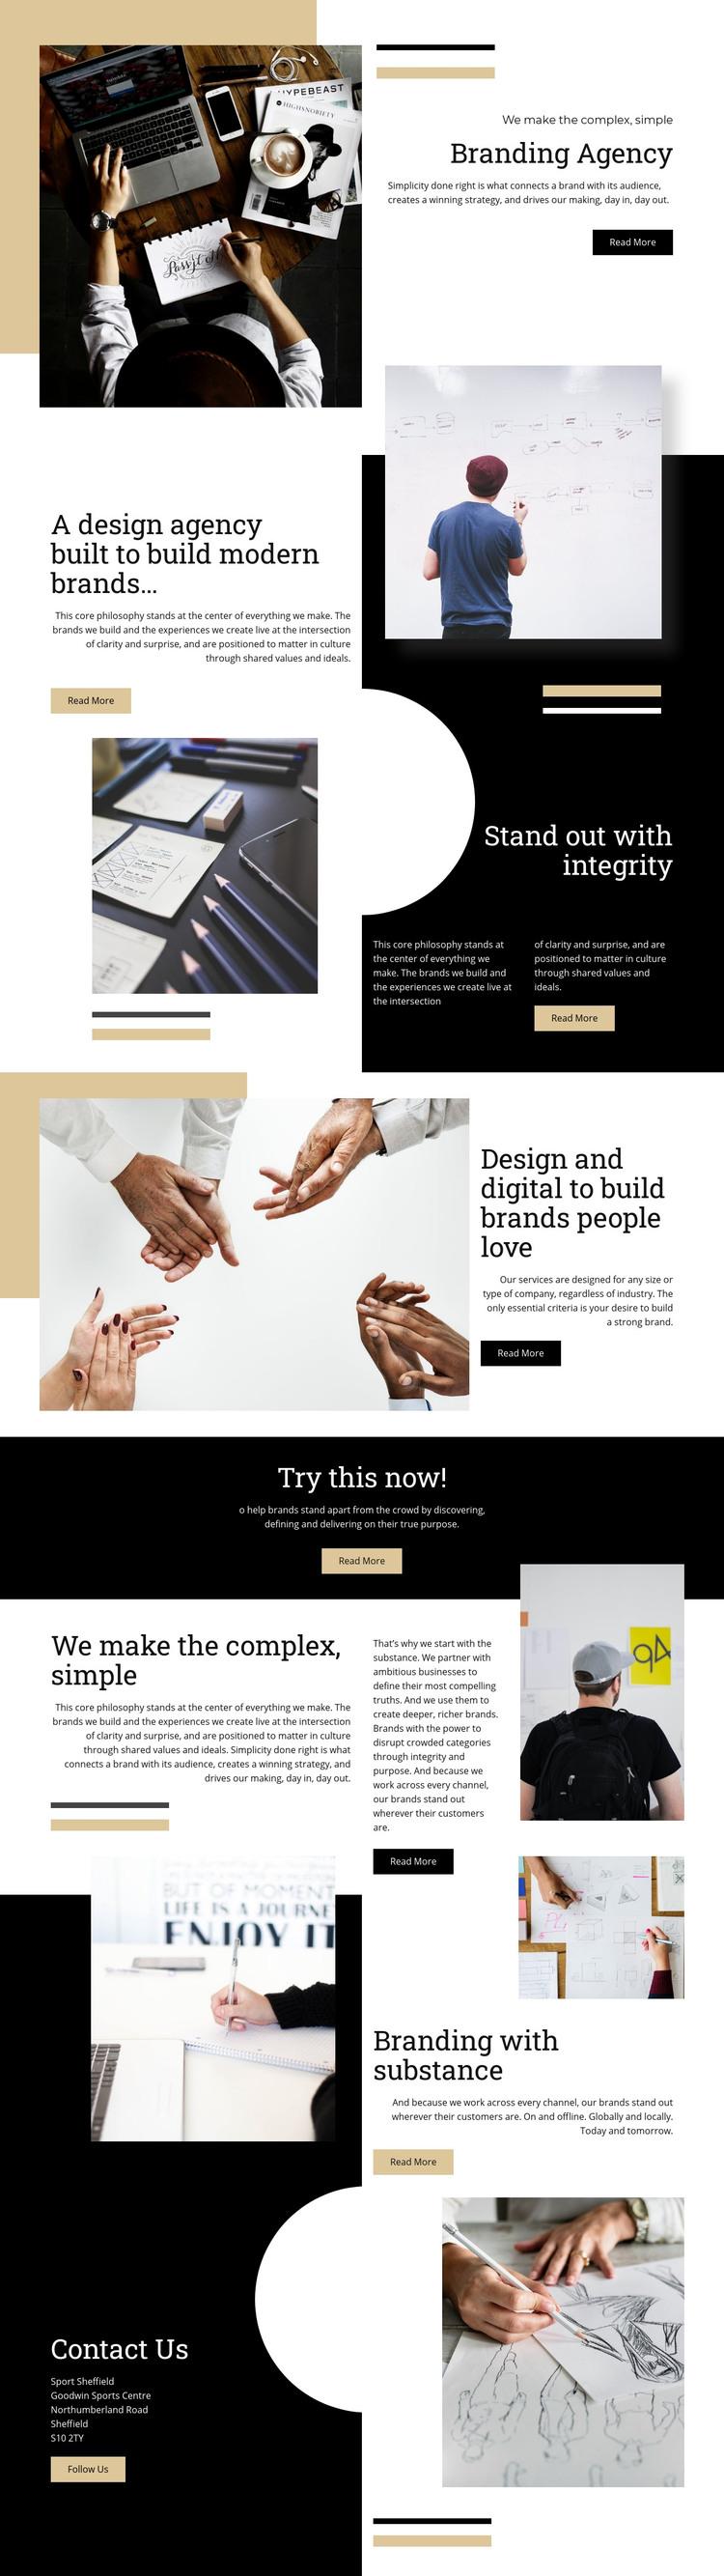 Branding Agency Homepage Design